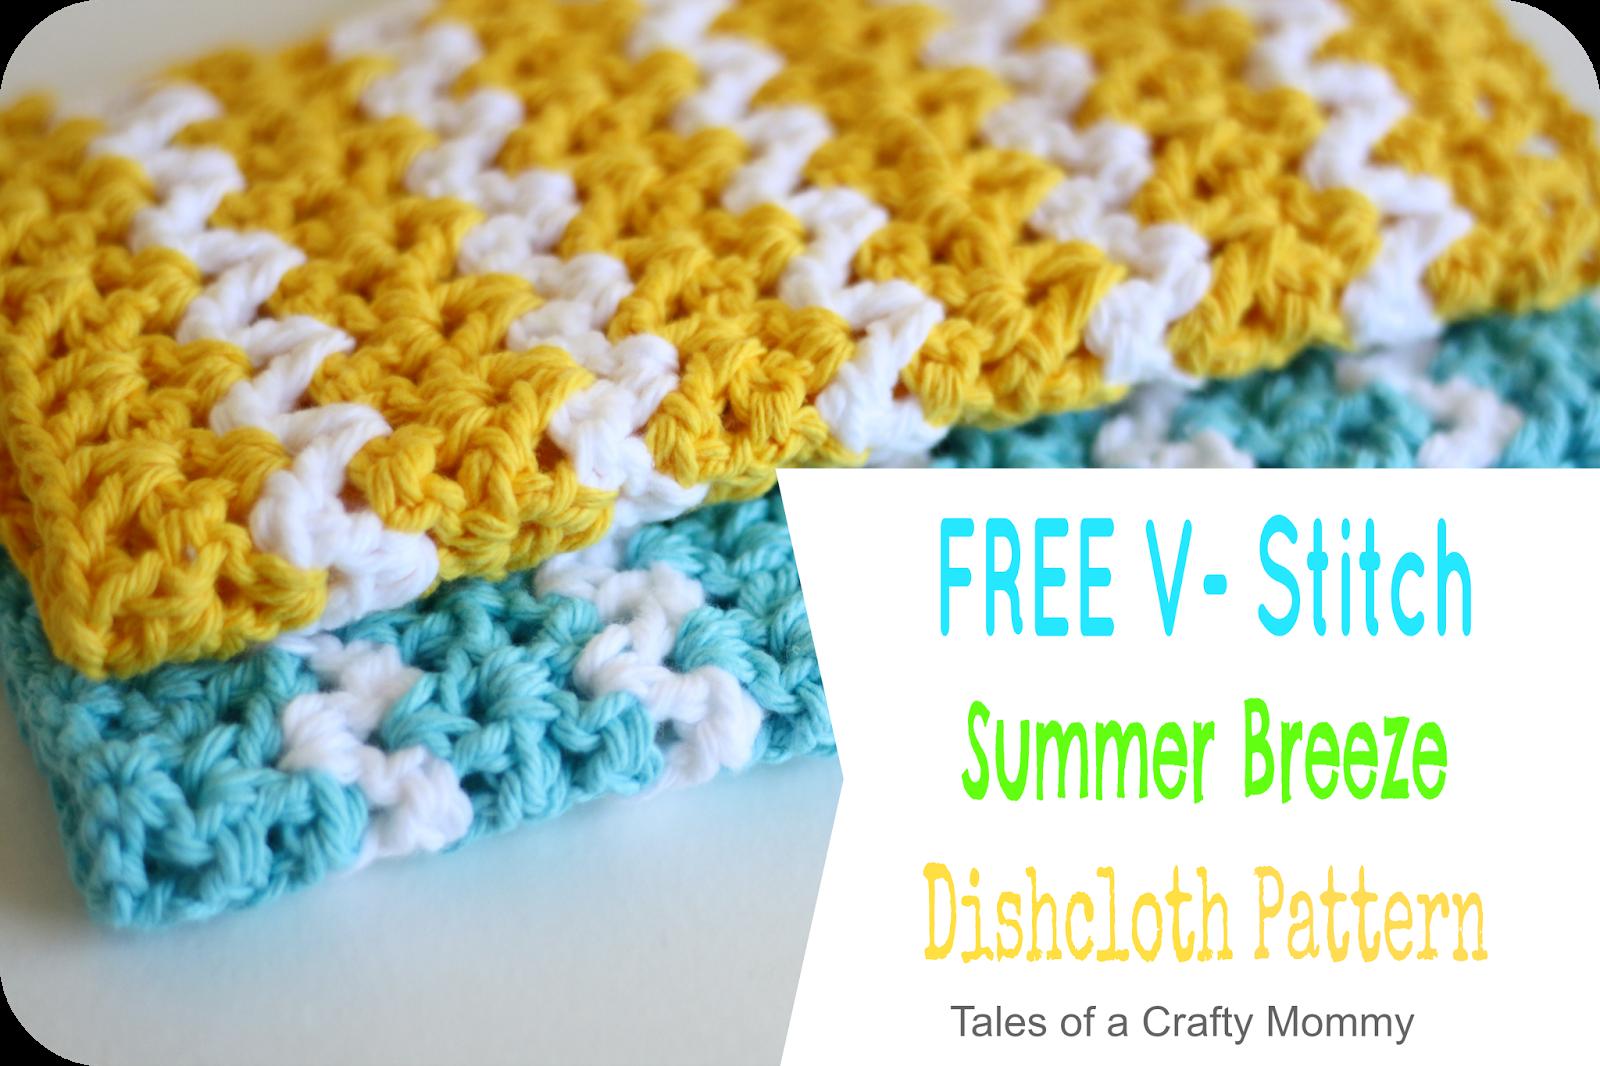 Free V-Stitch Dishcloth Pattern - Patron gratis (Tales of a Crafty ...